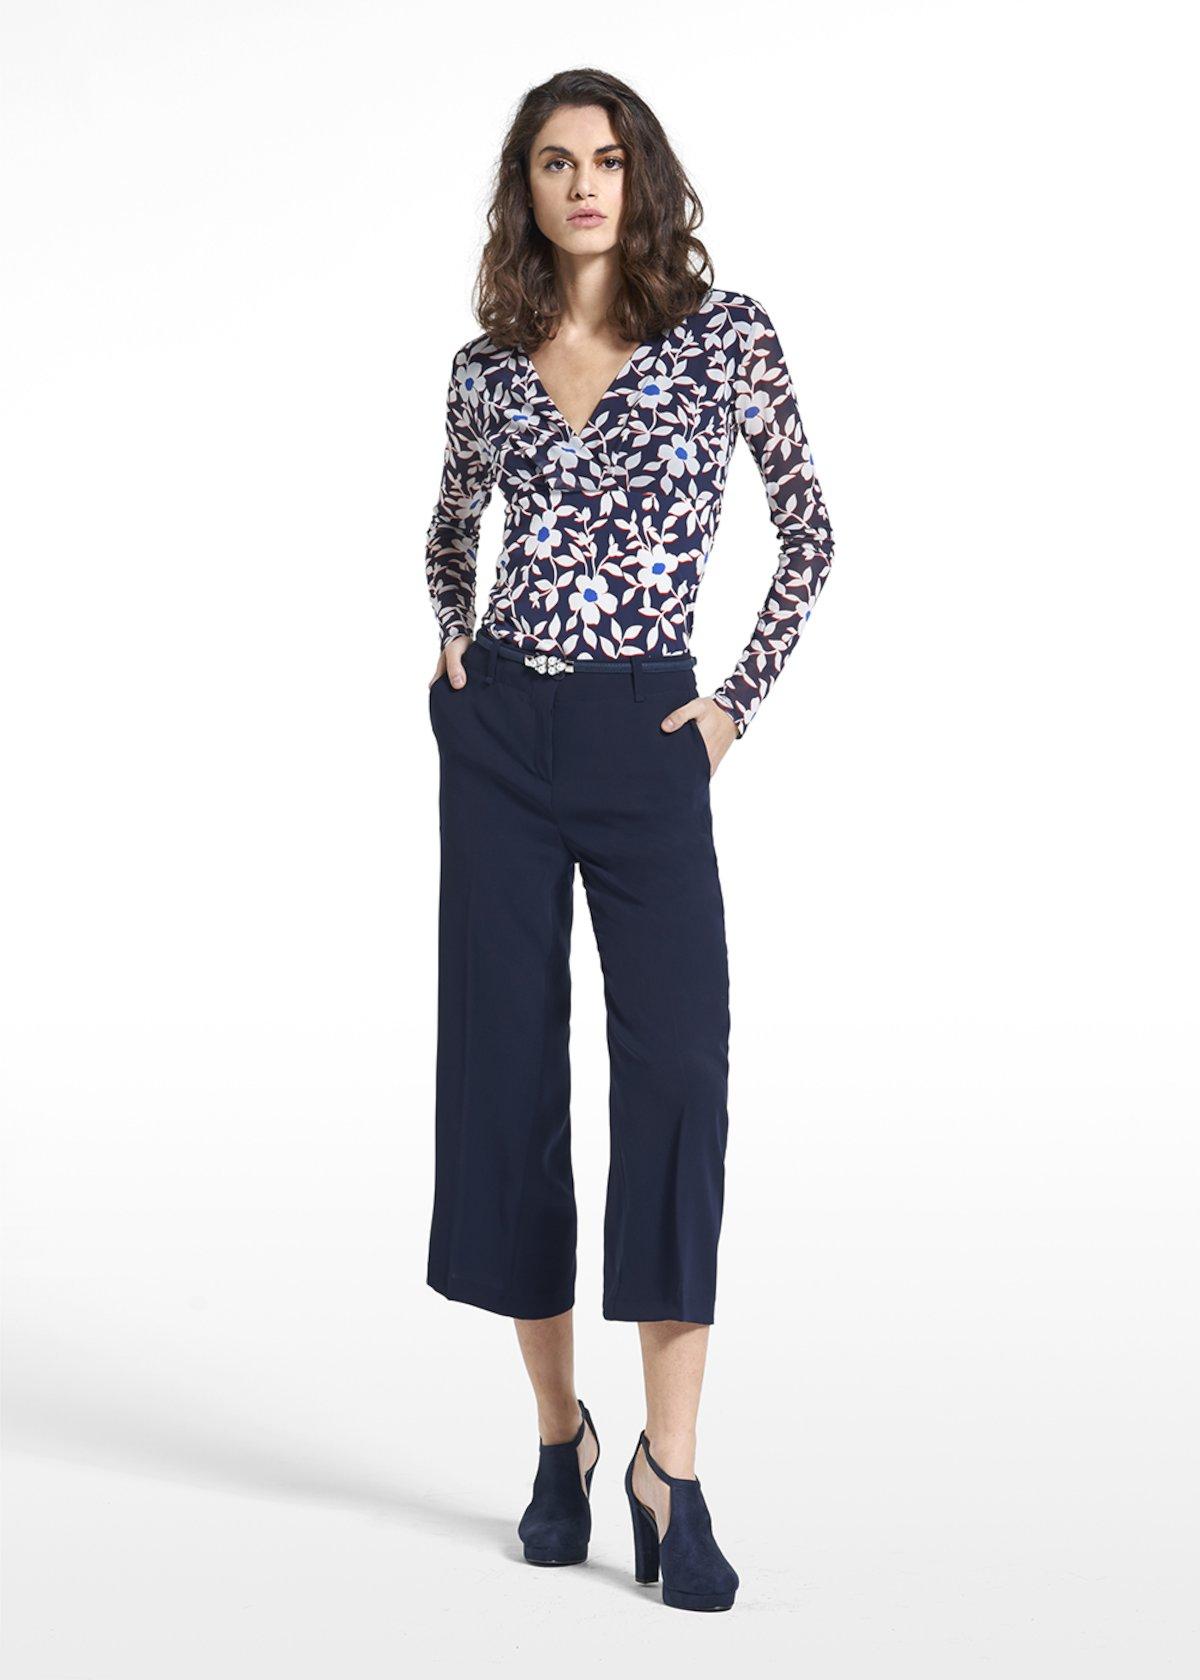 Long-sleeved t-shirt Samanta - Blue / White Fantasia - Woman